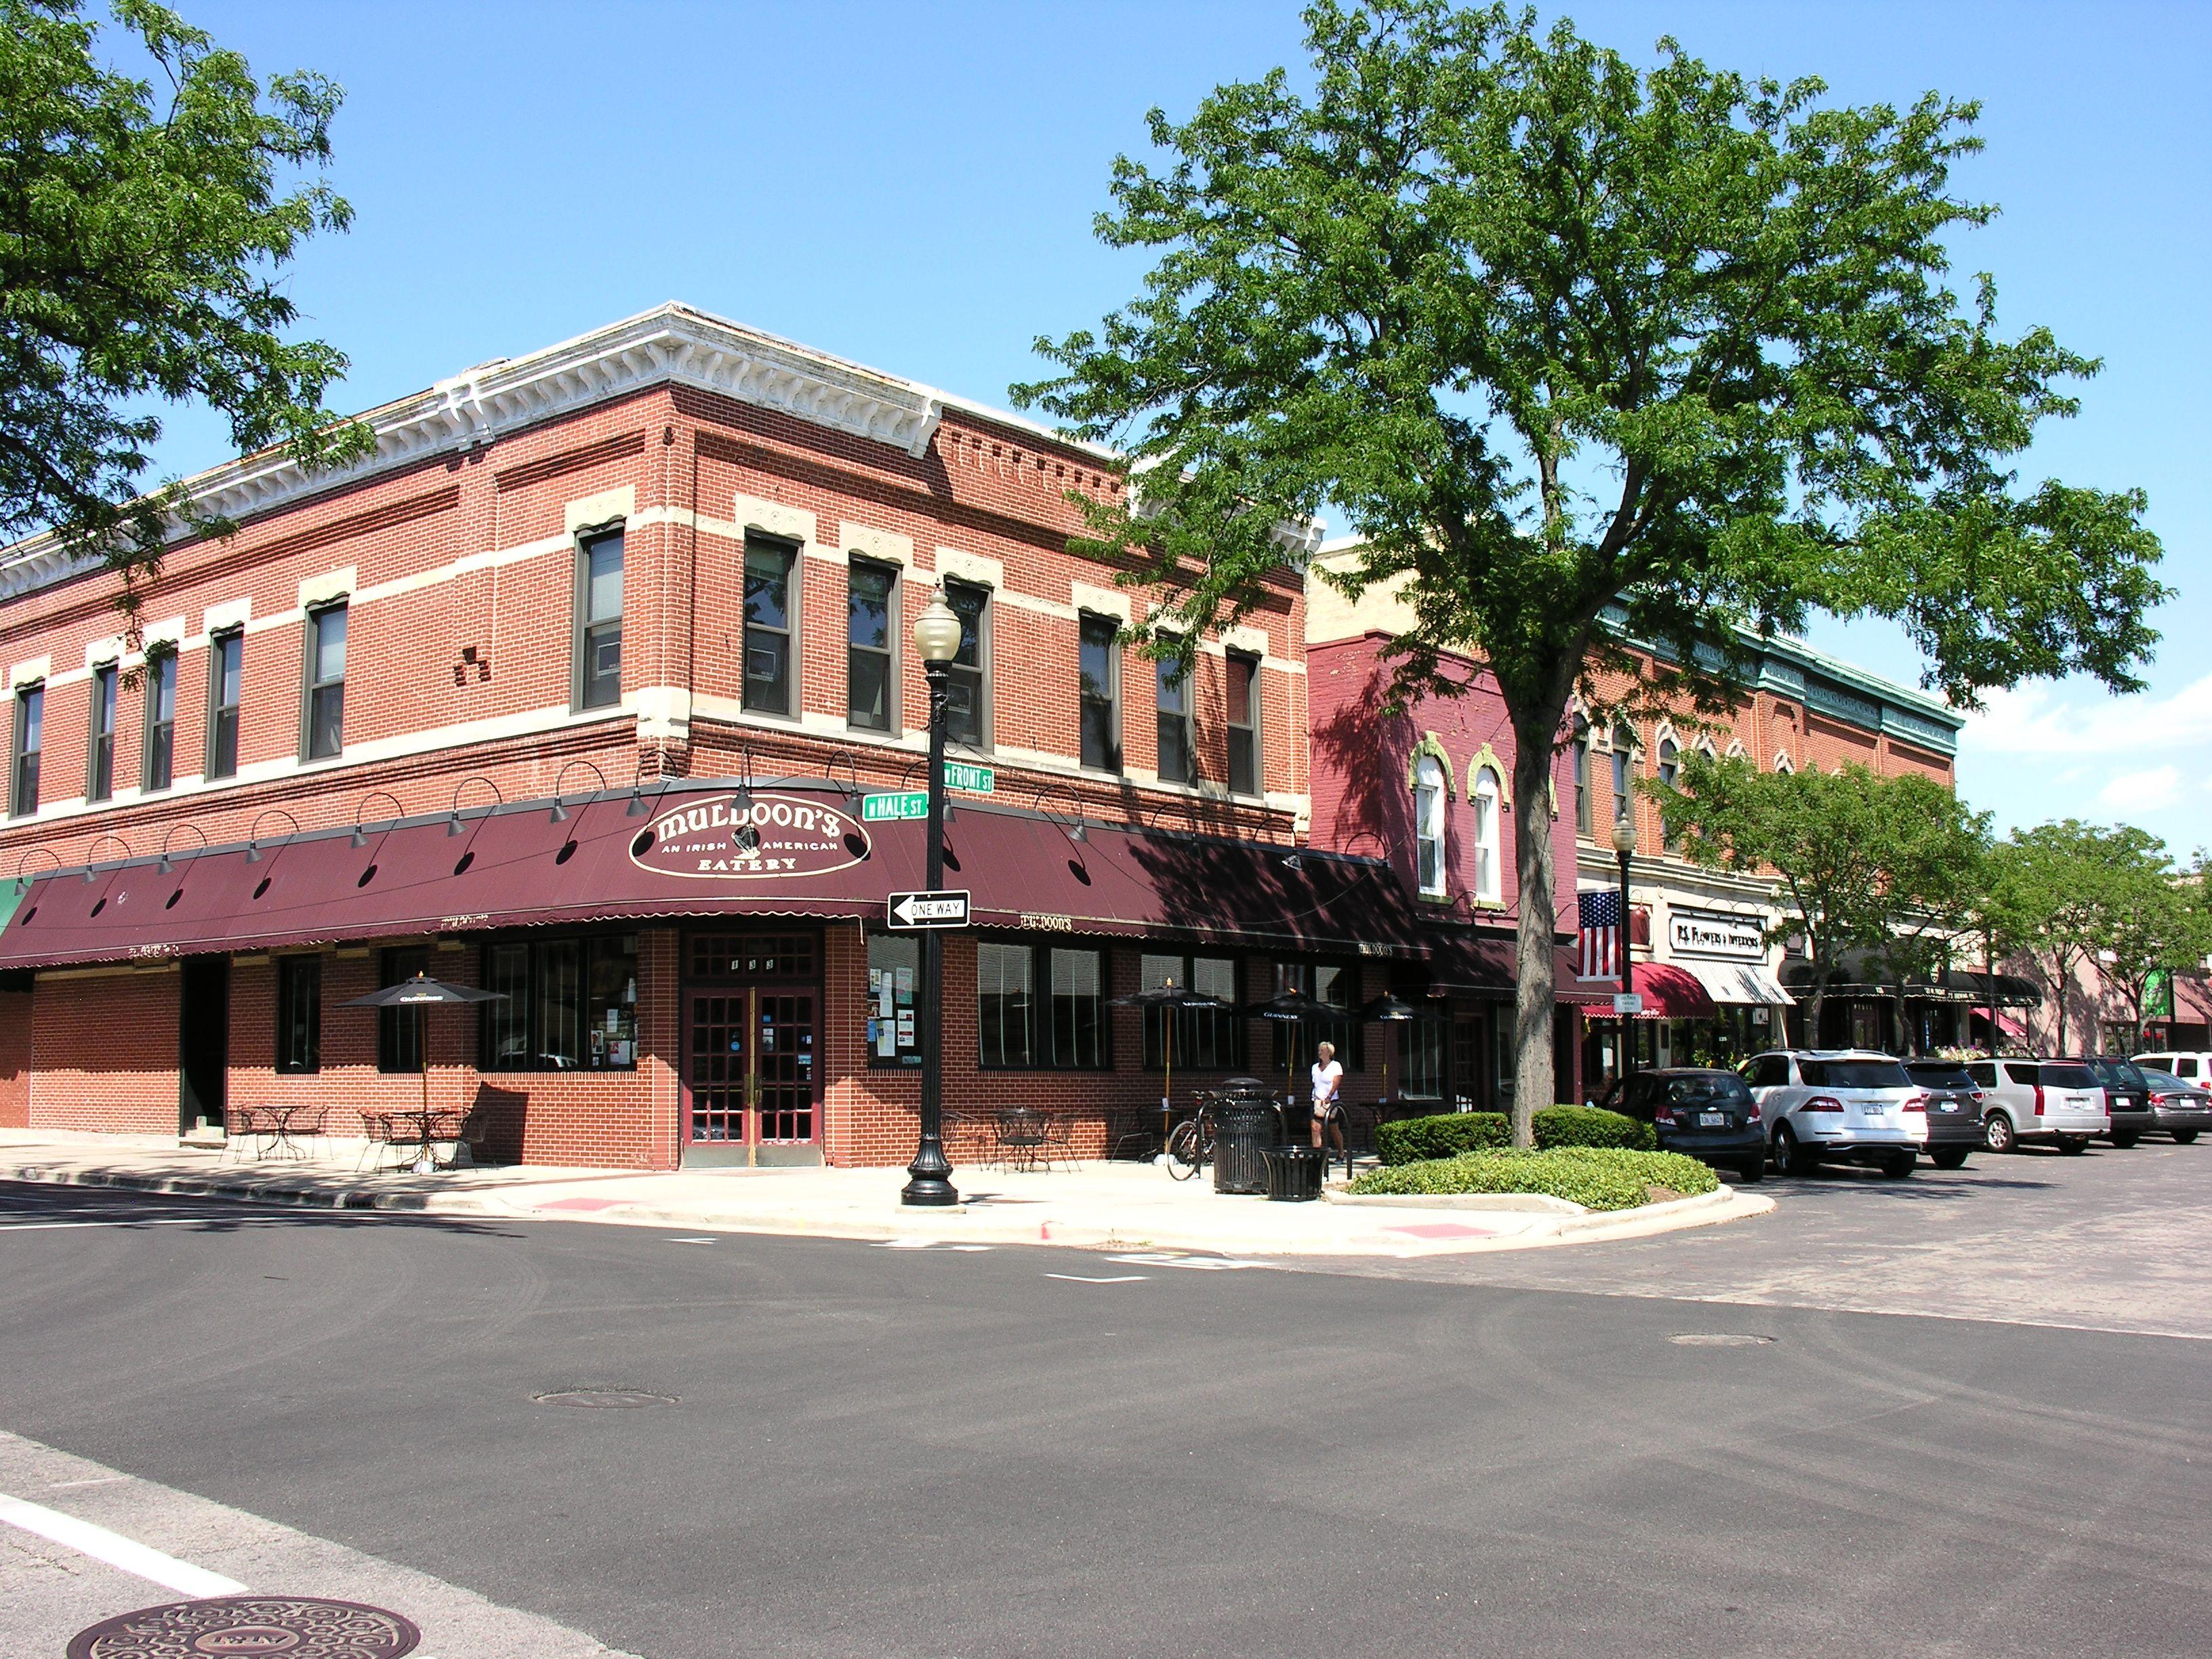 Downtown Wheaton